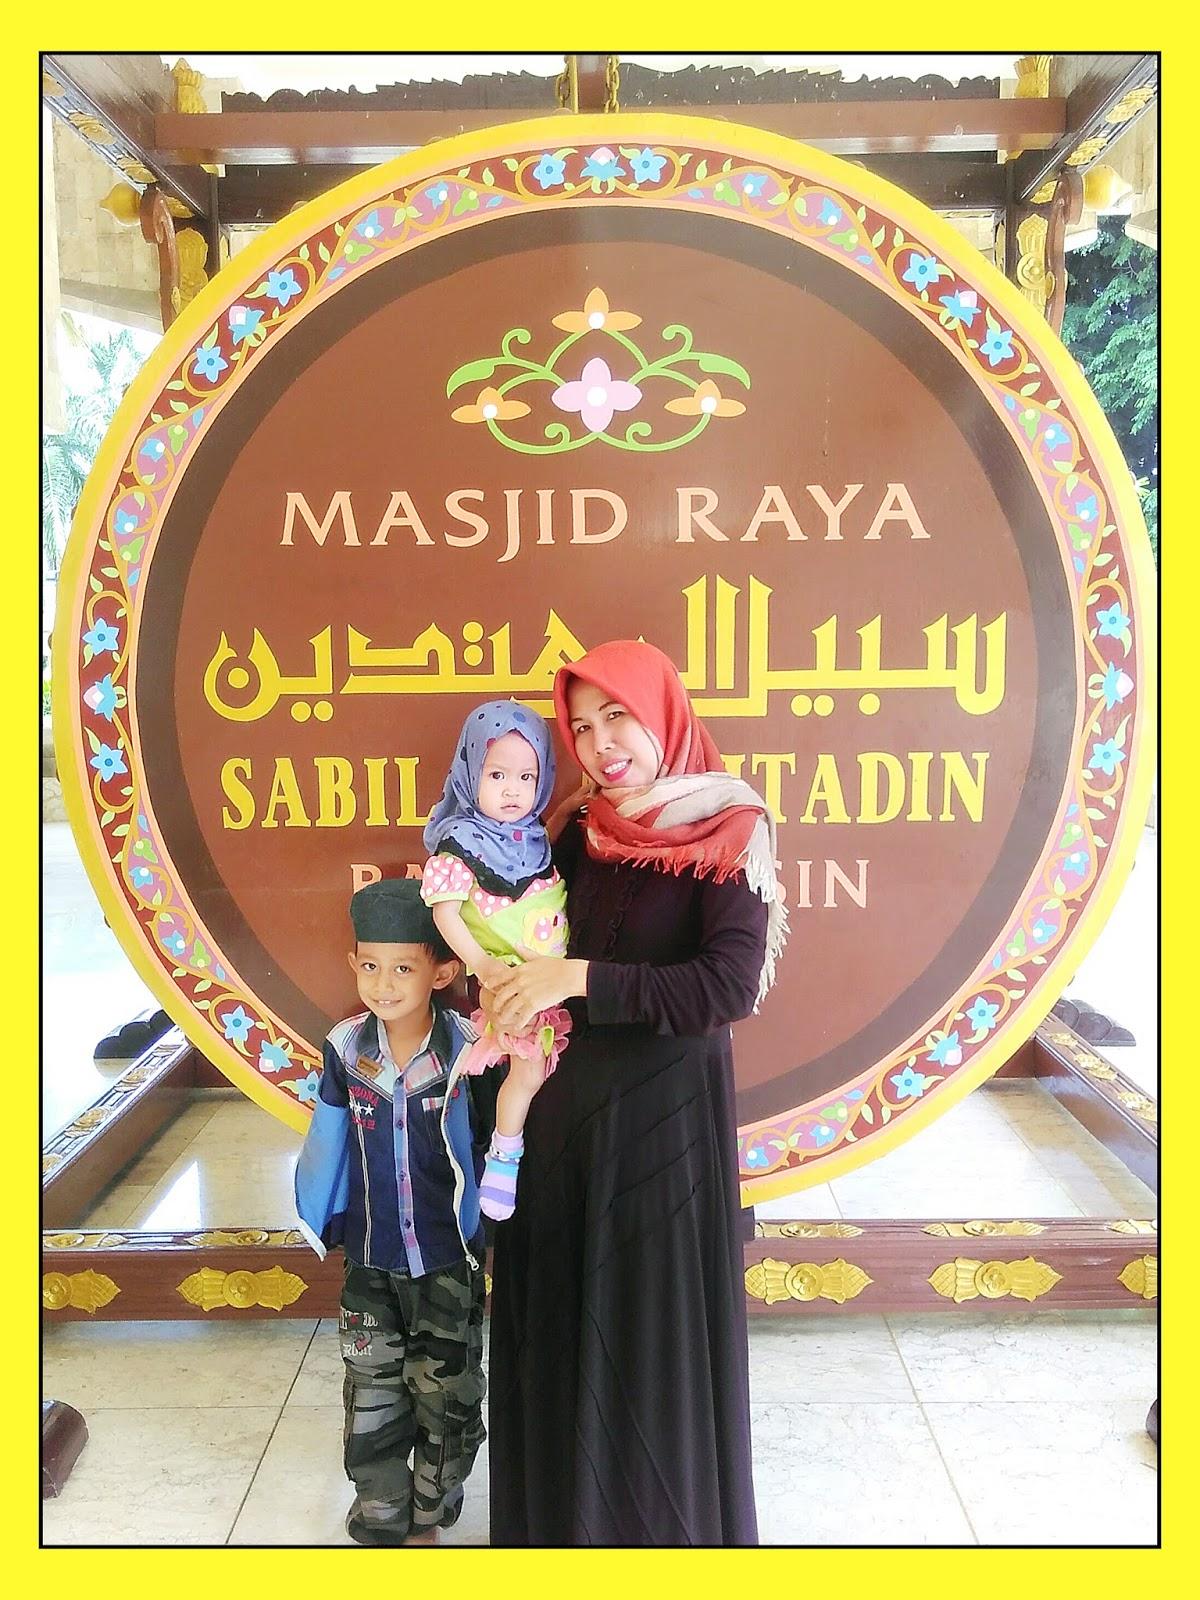 Daftar Tempat Wisata Kota Banjarmasin Potret Banua Mesjid Raya Sabilal